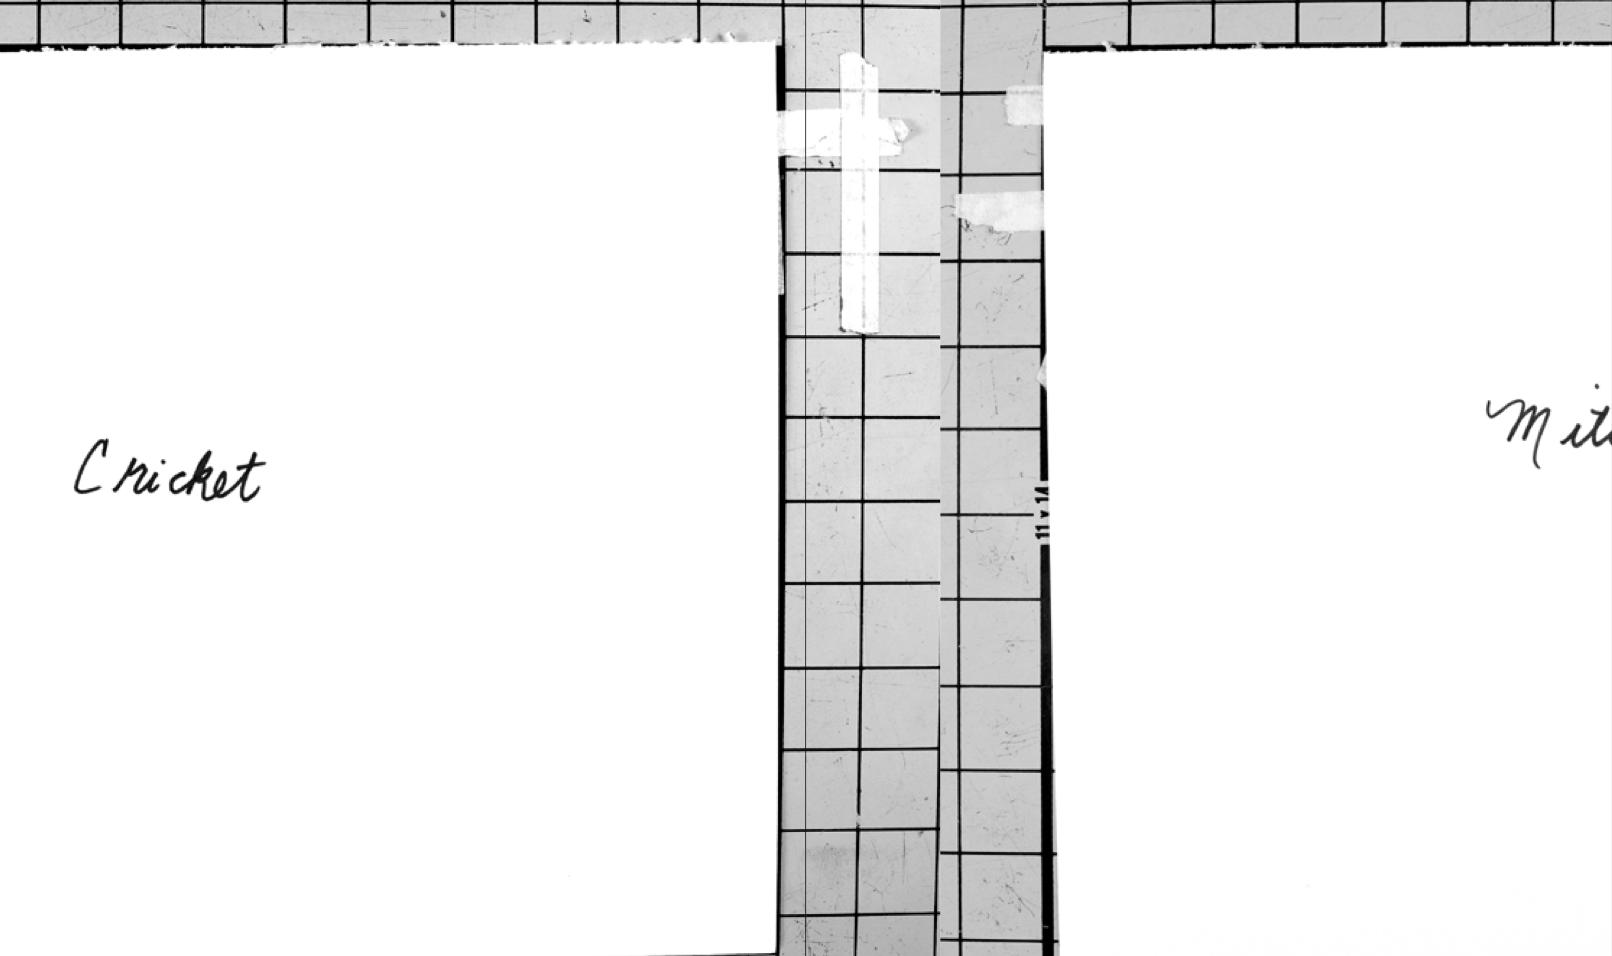 p.238-239